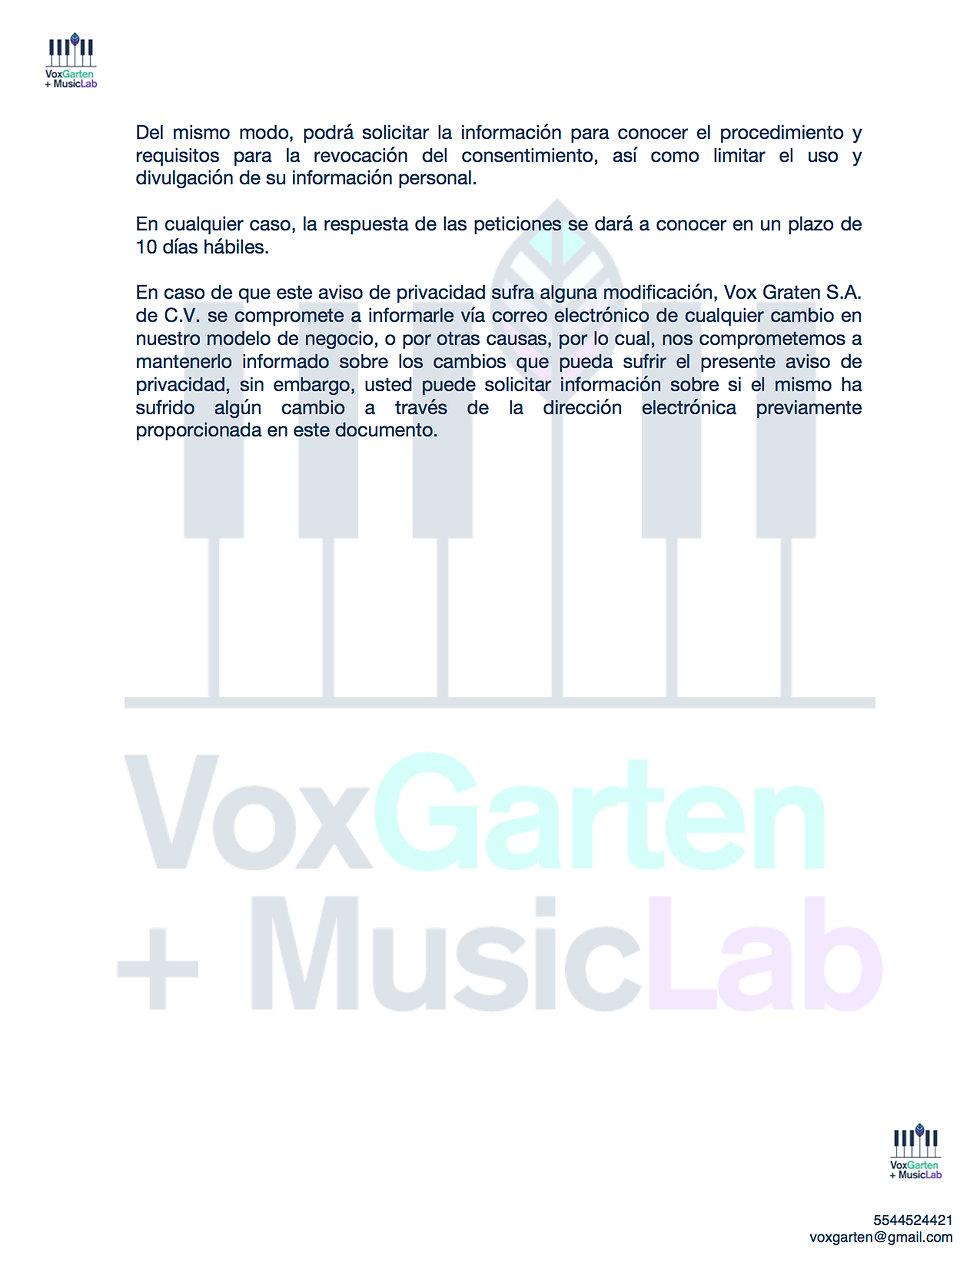 AVISO DE PRIVACIDAD VG+ML3.jpg